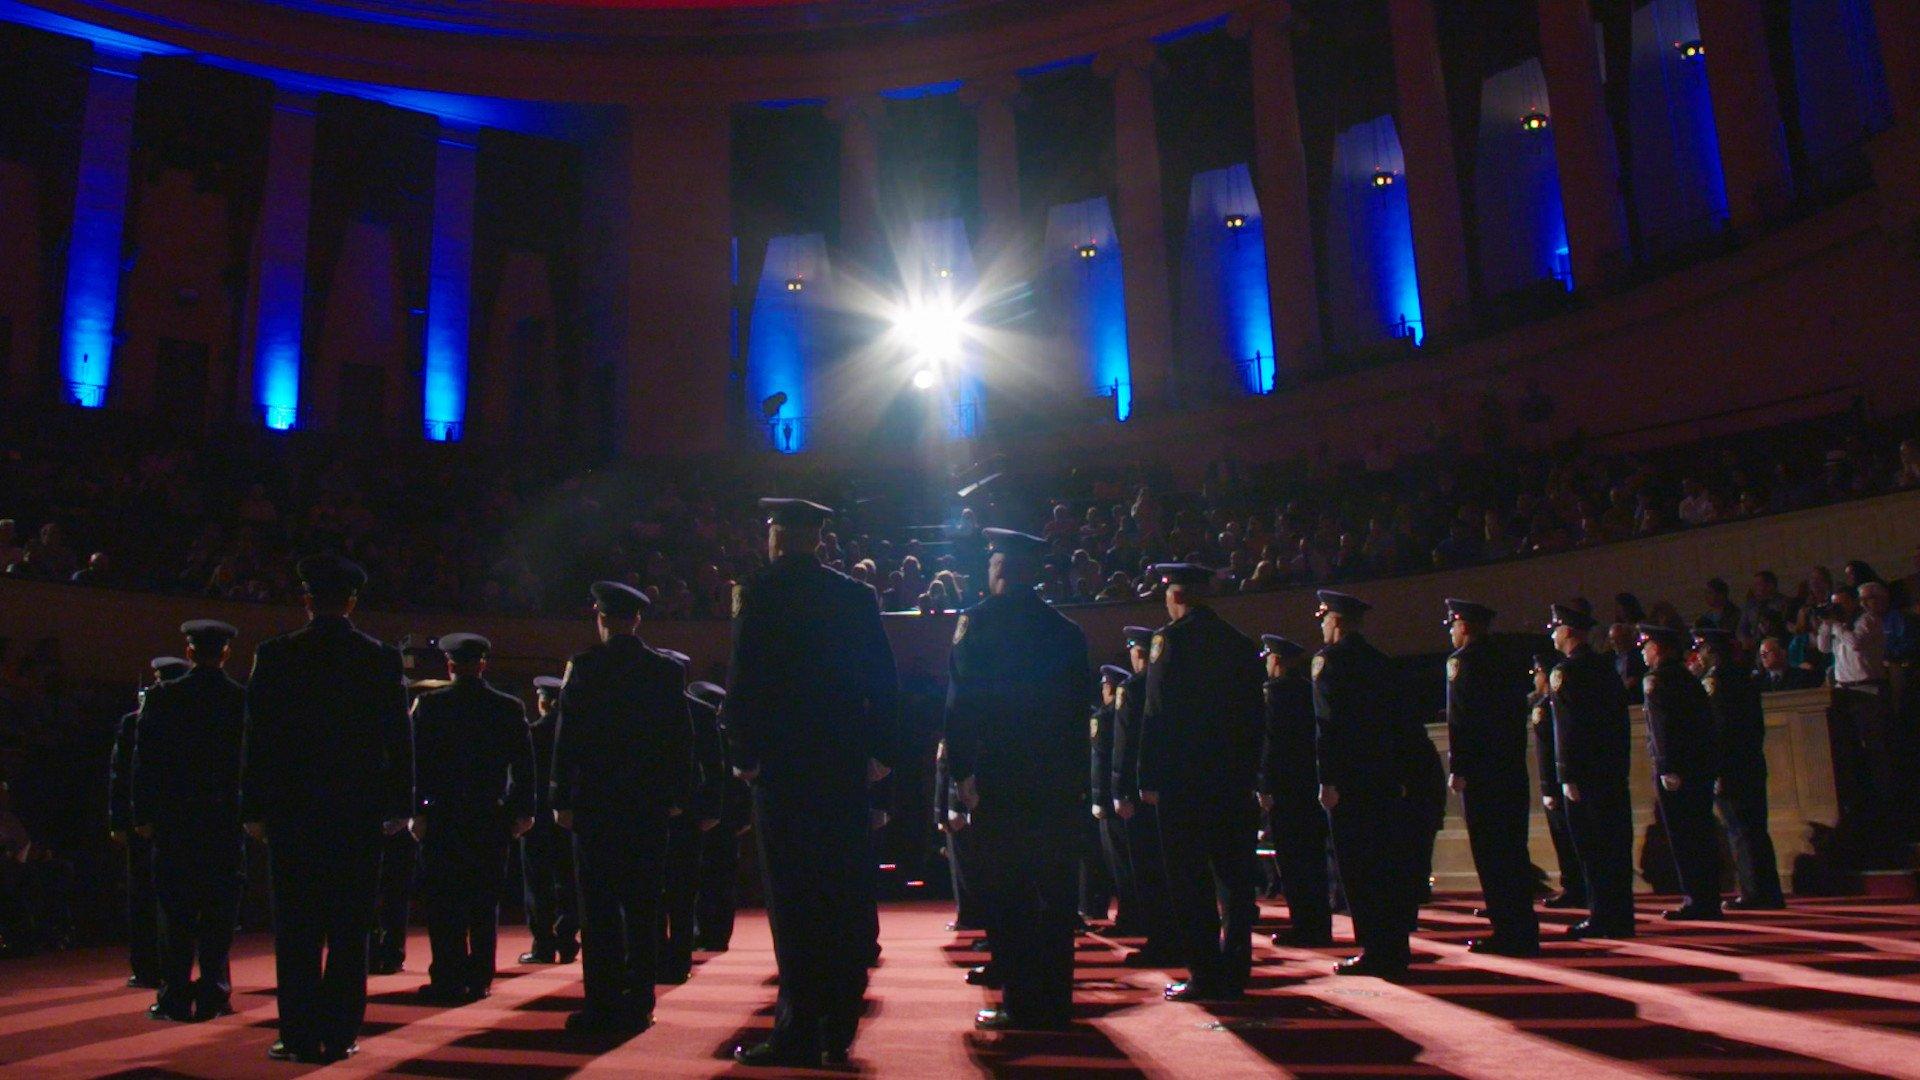 2017-AFI-DOCS-capsule-reviews-The-Force